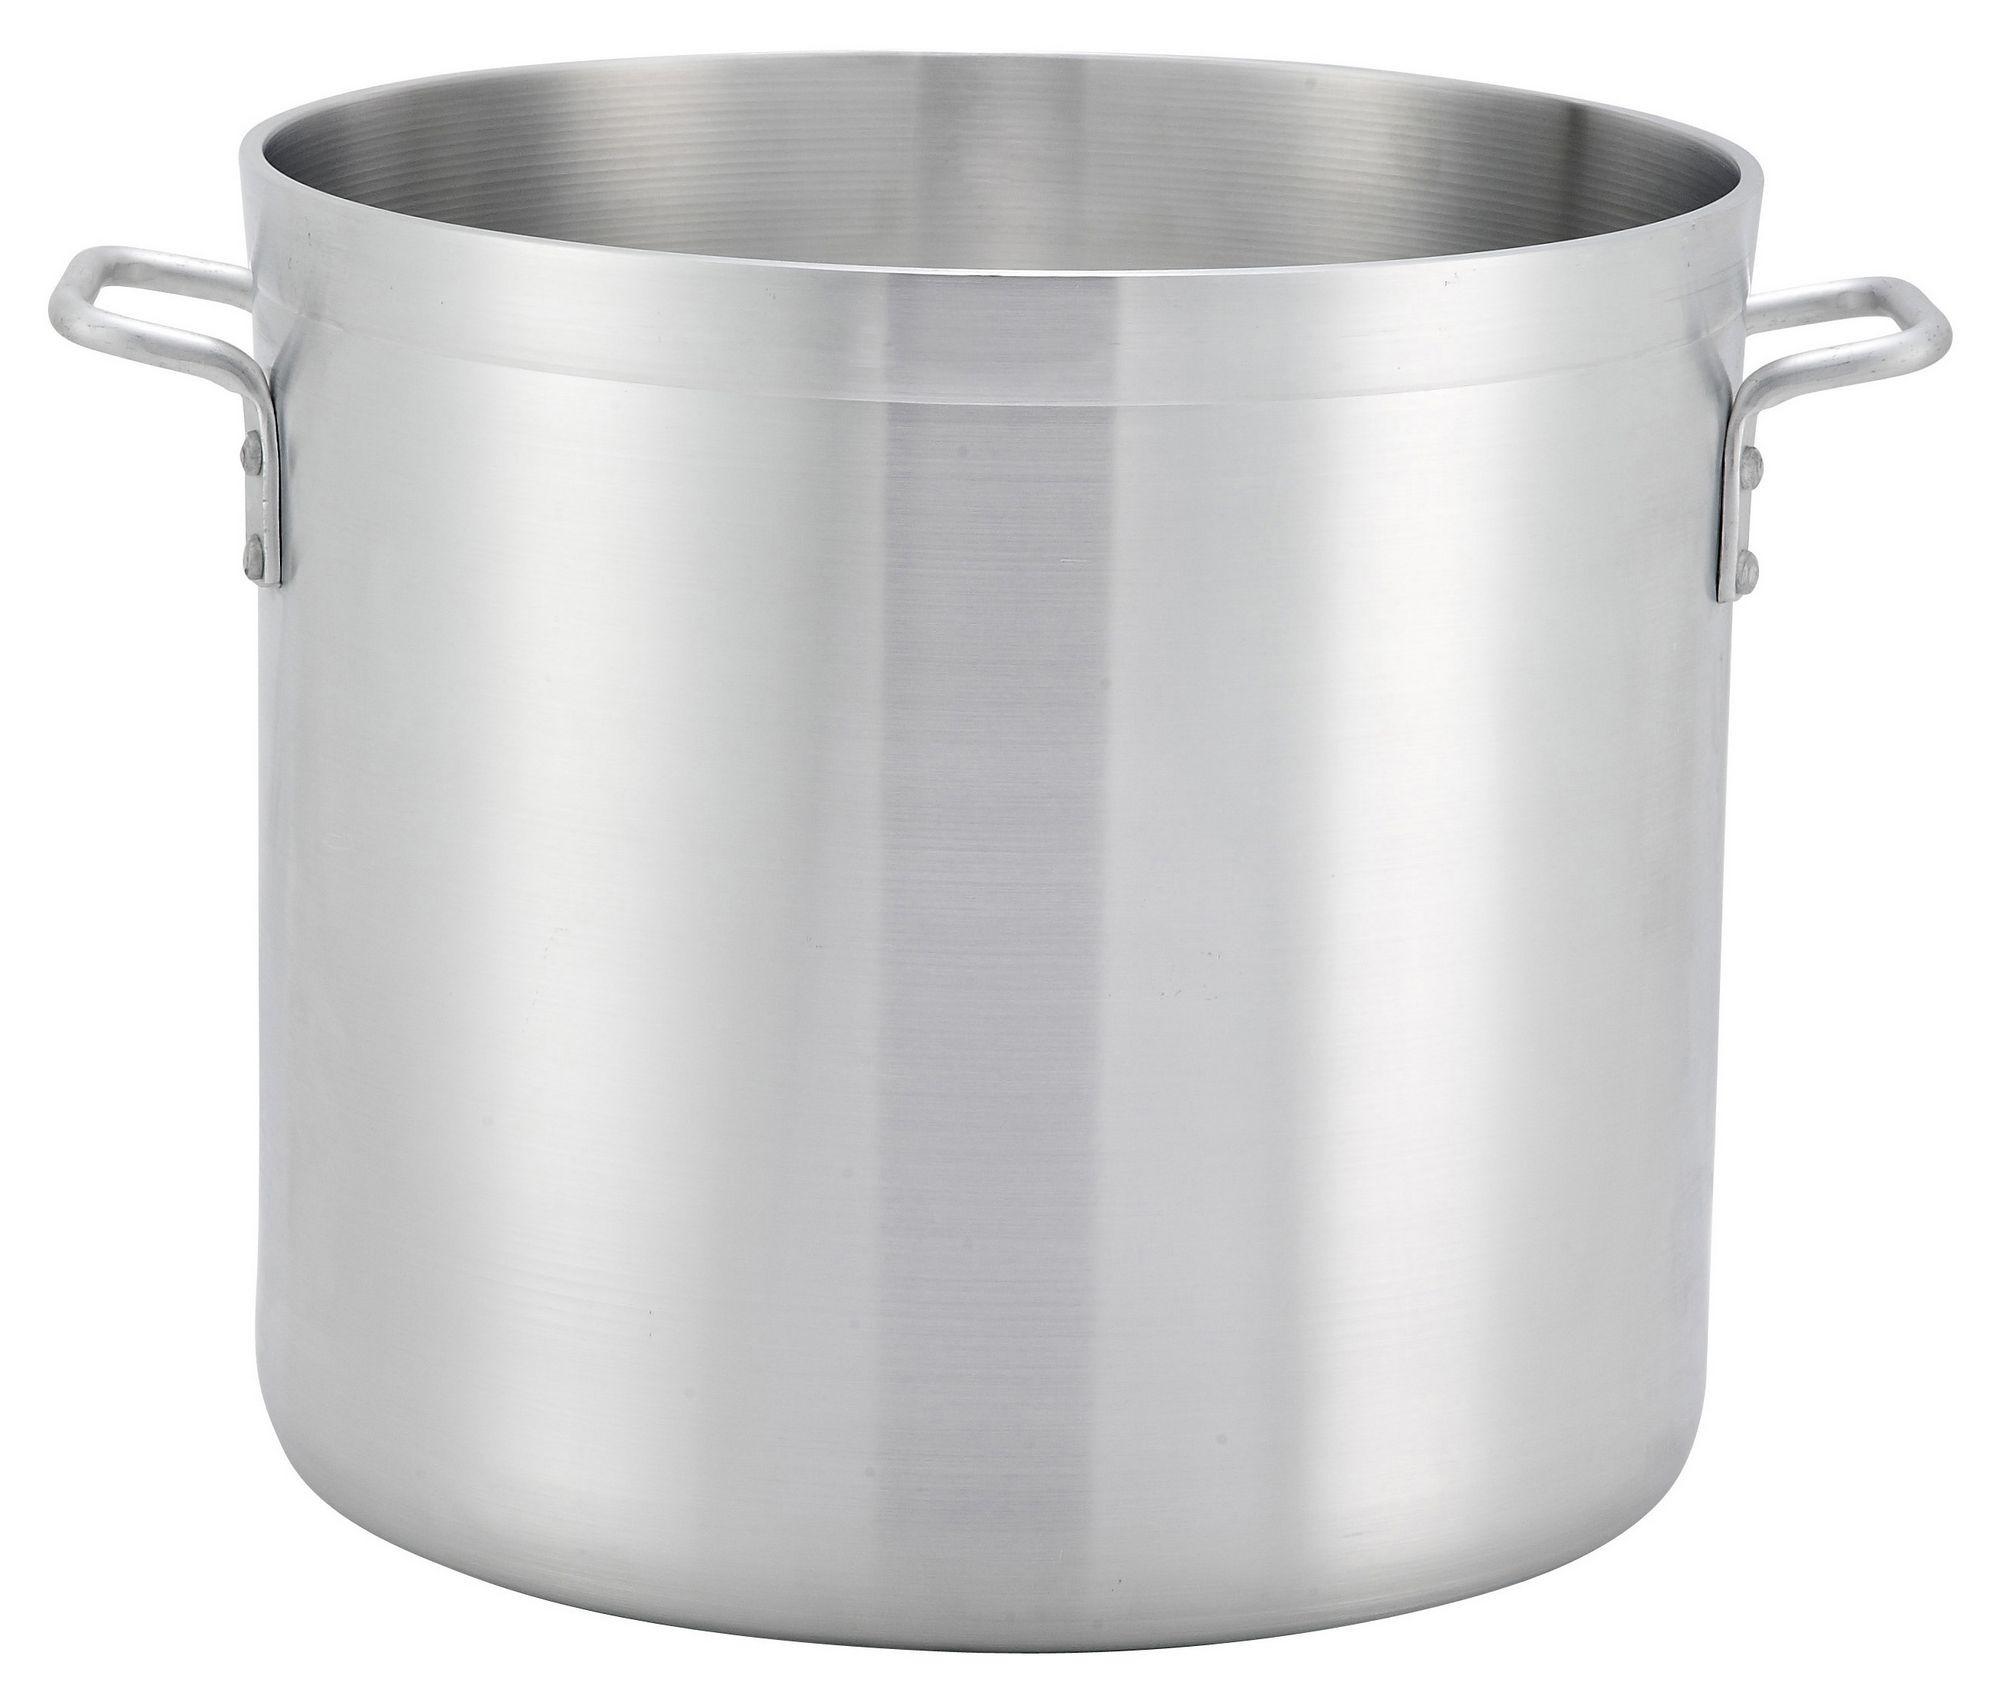 Winco ALHP-160 Precision Aluminum 160 Qt. Stock Pot